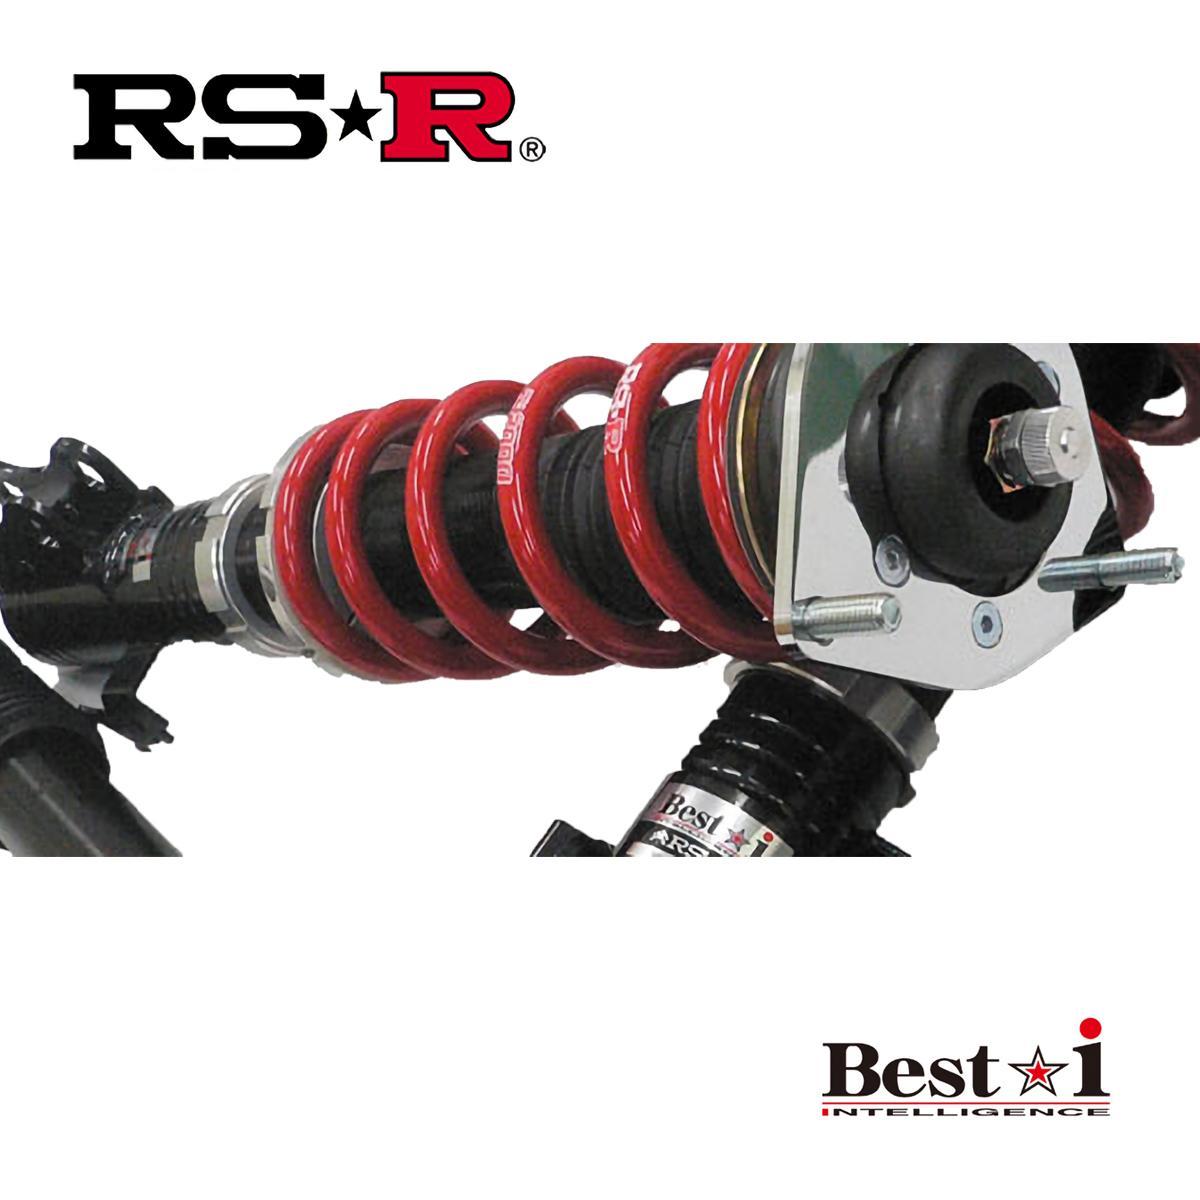 RS-R カローラスポーツ ハイブリッドG X ZWE211H 車高調 リア車高調整:ネジ式/ソフトバネレート仕様 BIT576S ベストi RSR 条件付き送料無料